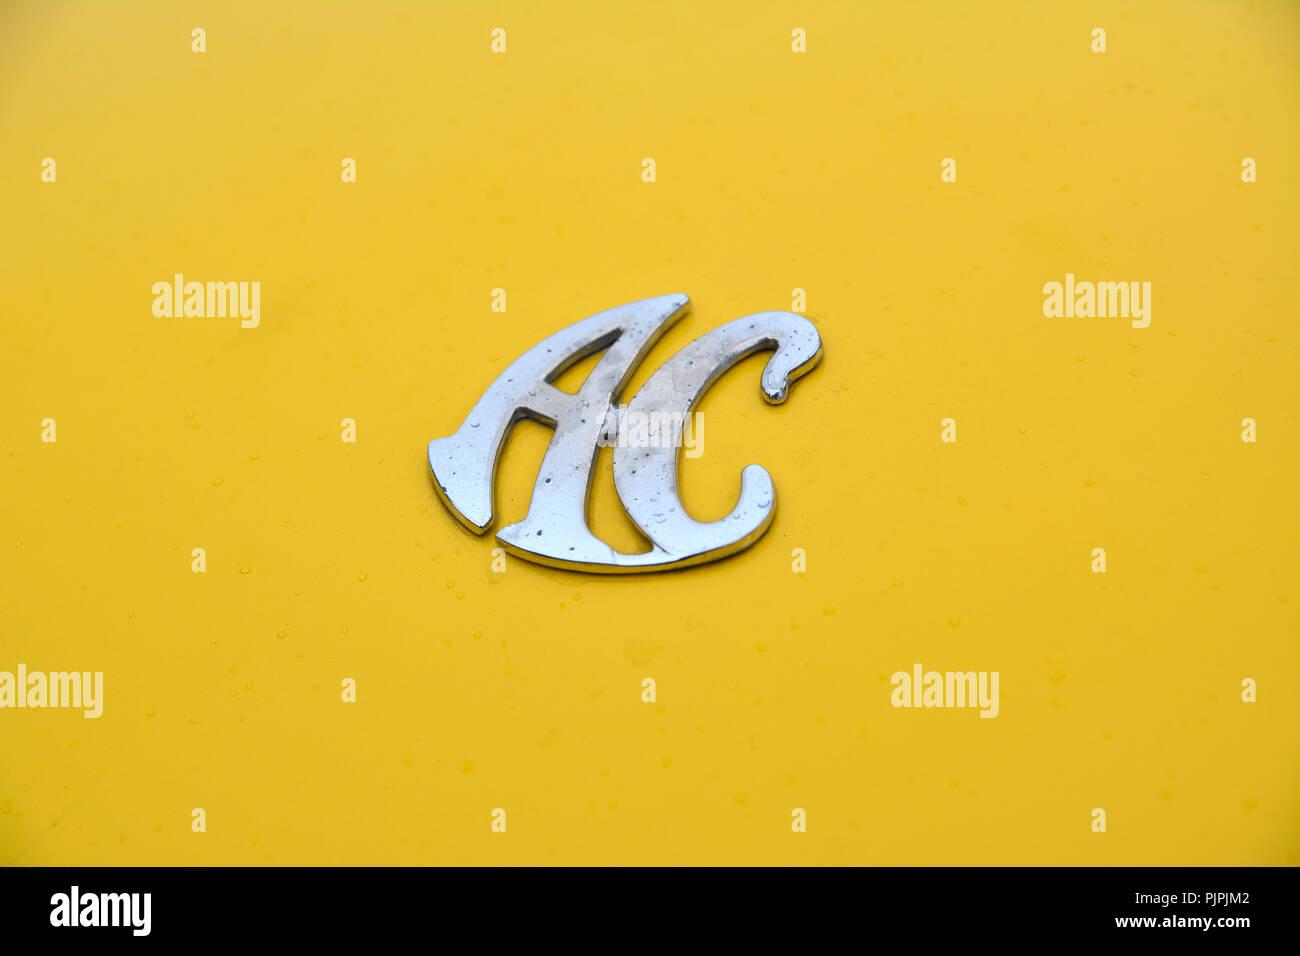 Close up picture of a classic AC Cobra car - Stock Image